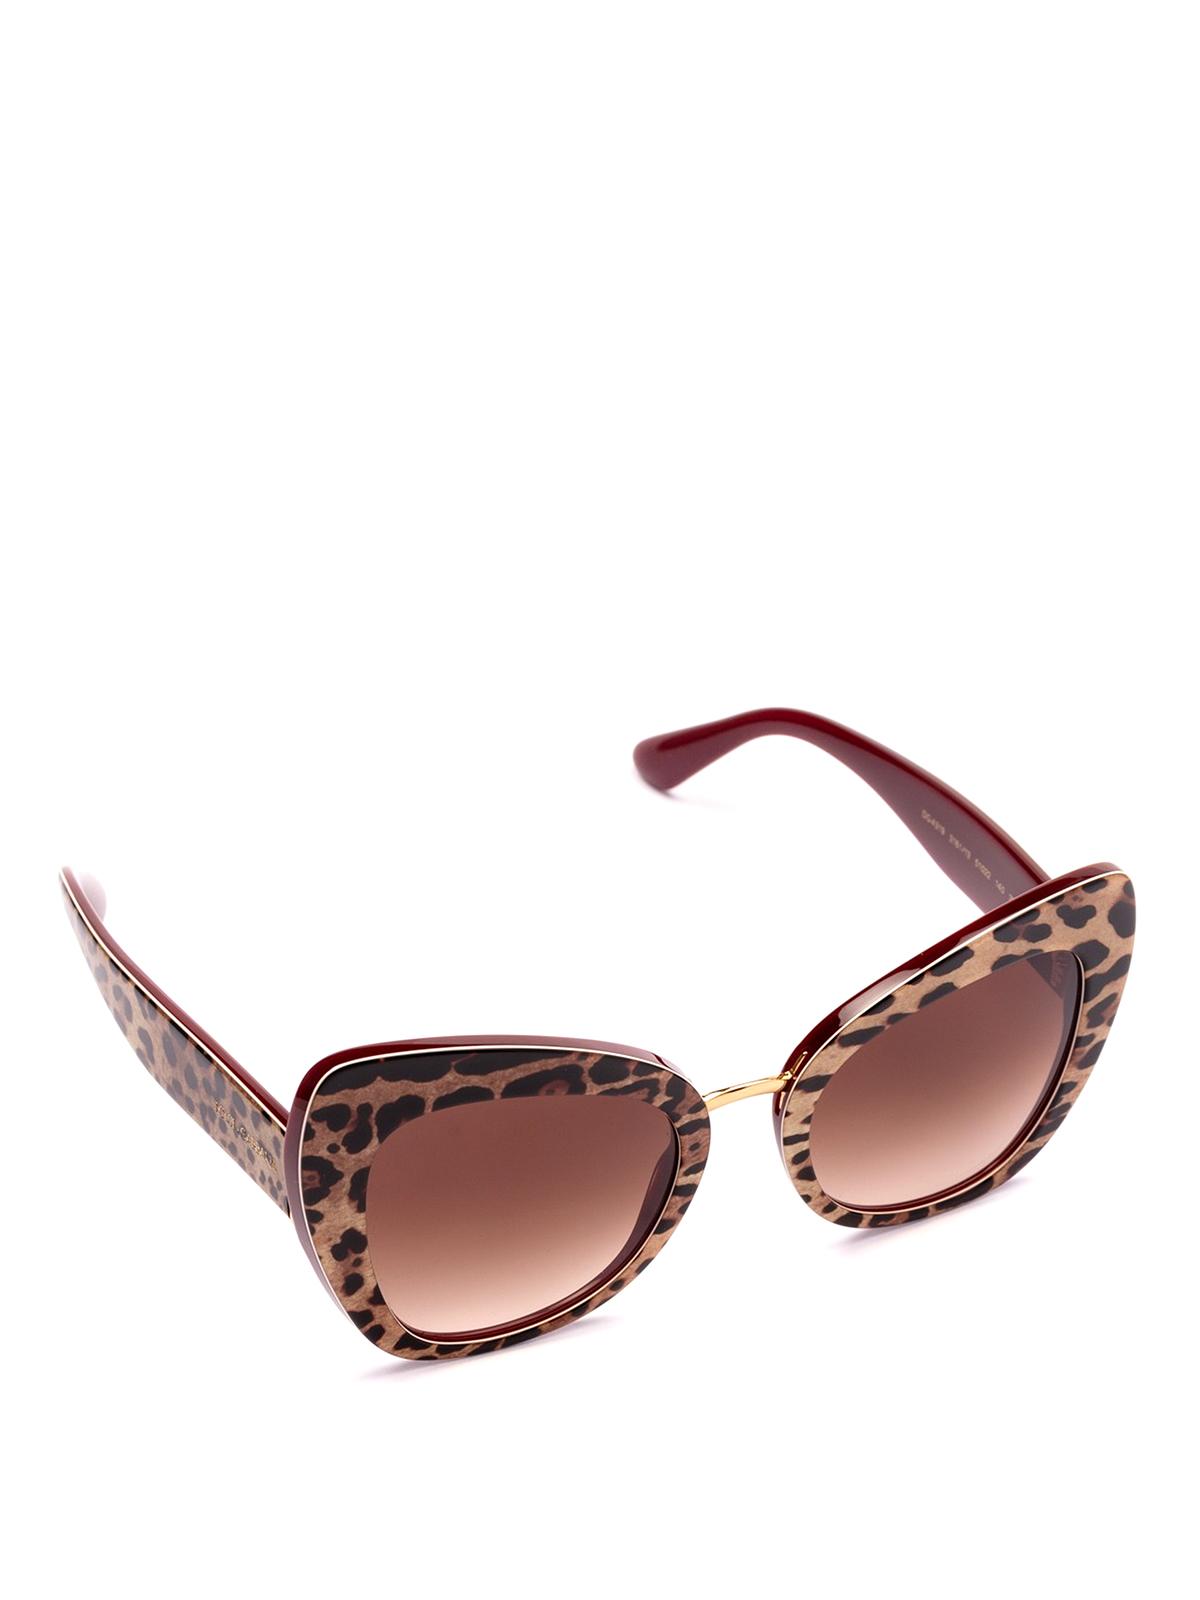 3f047c19b144 DOLCE & GABBANA: sunglasses - Animal print acetate cat eye sunglasses